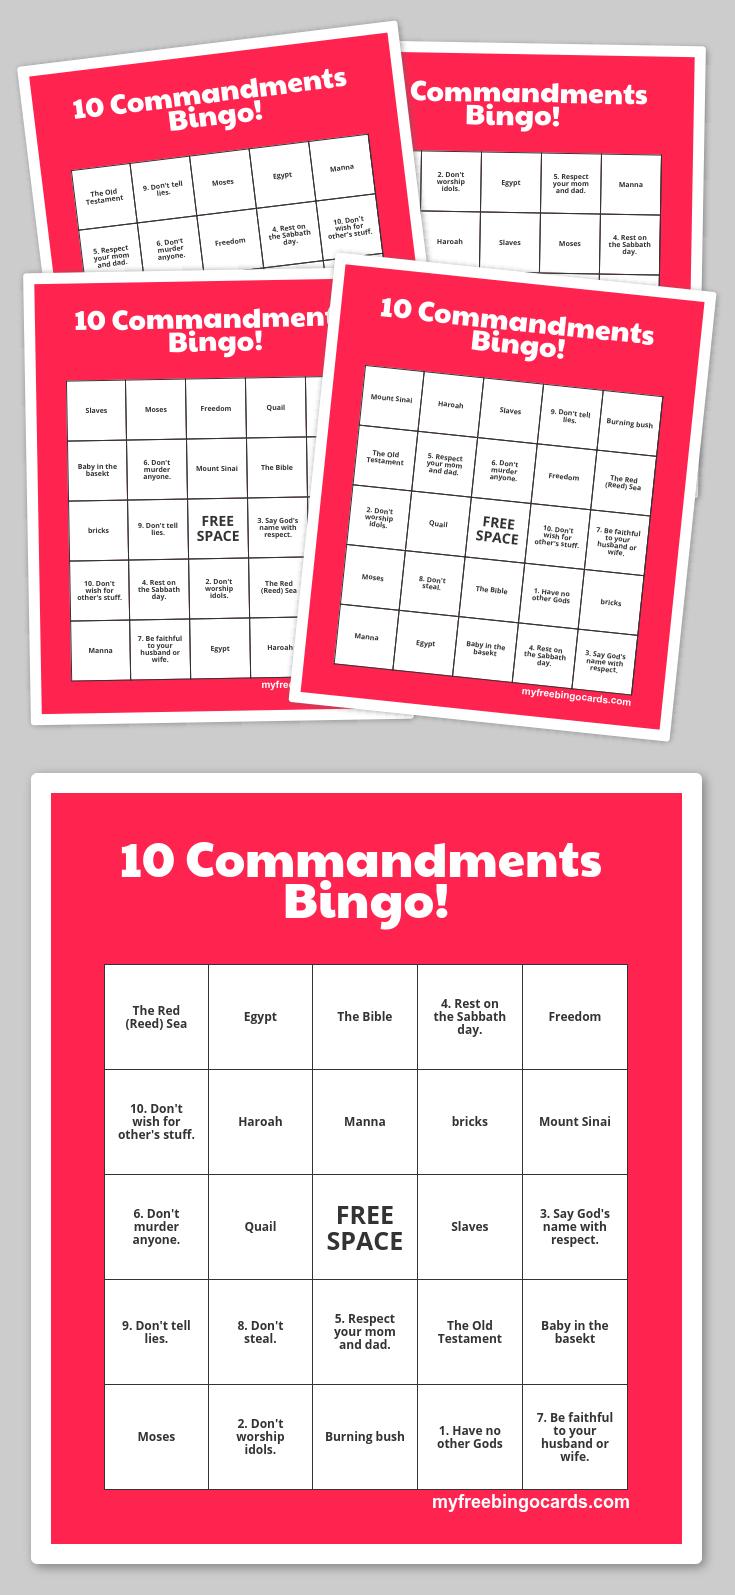 Free Printable Bingo Cards | The 10 Commandments | Sunday School - Free Printable Bible Bingo For Preschoolers